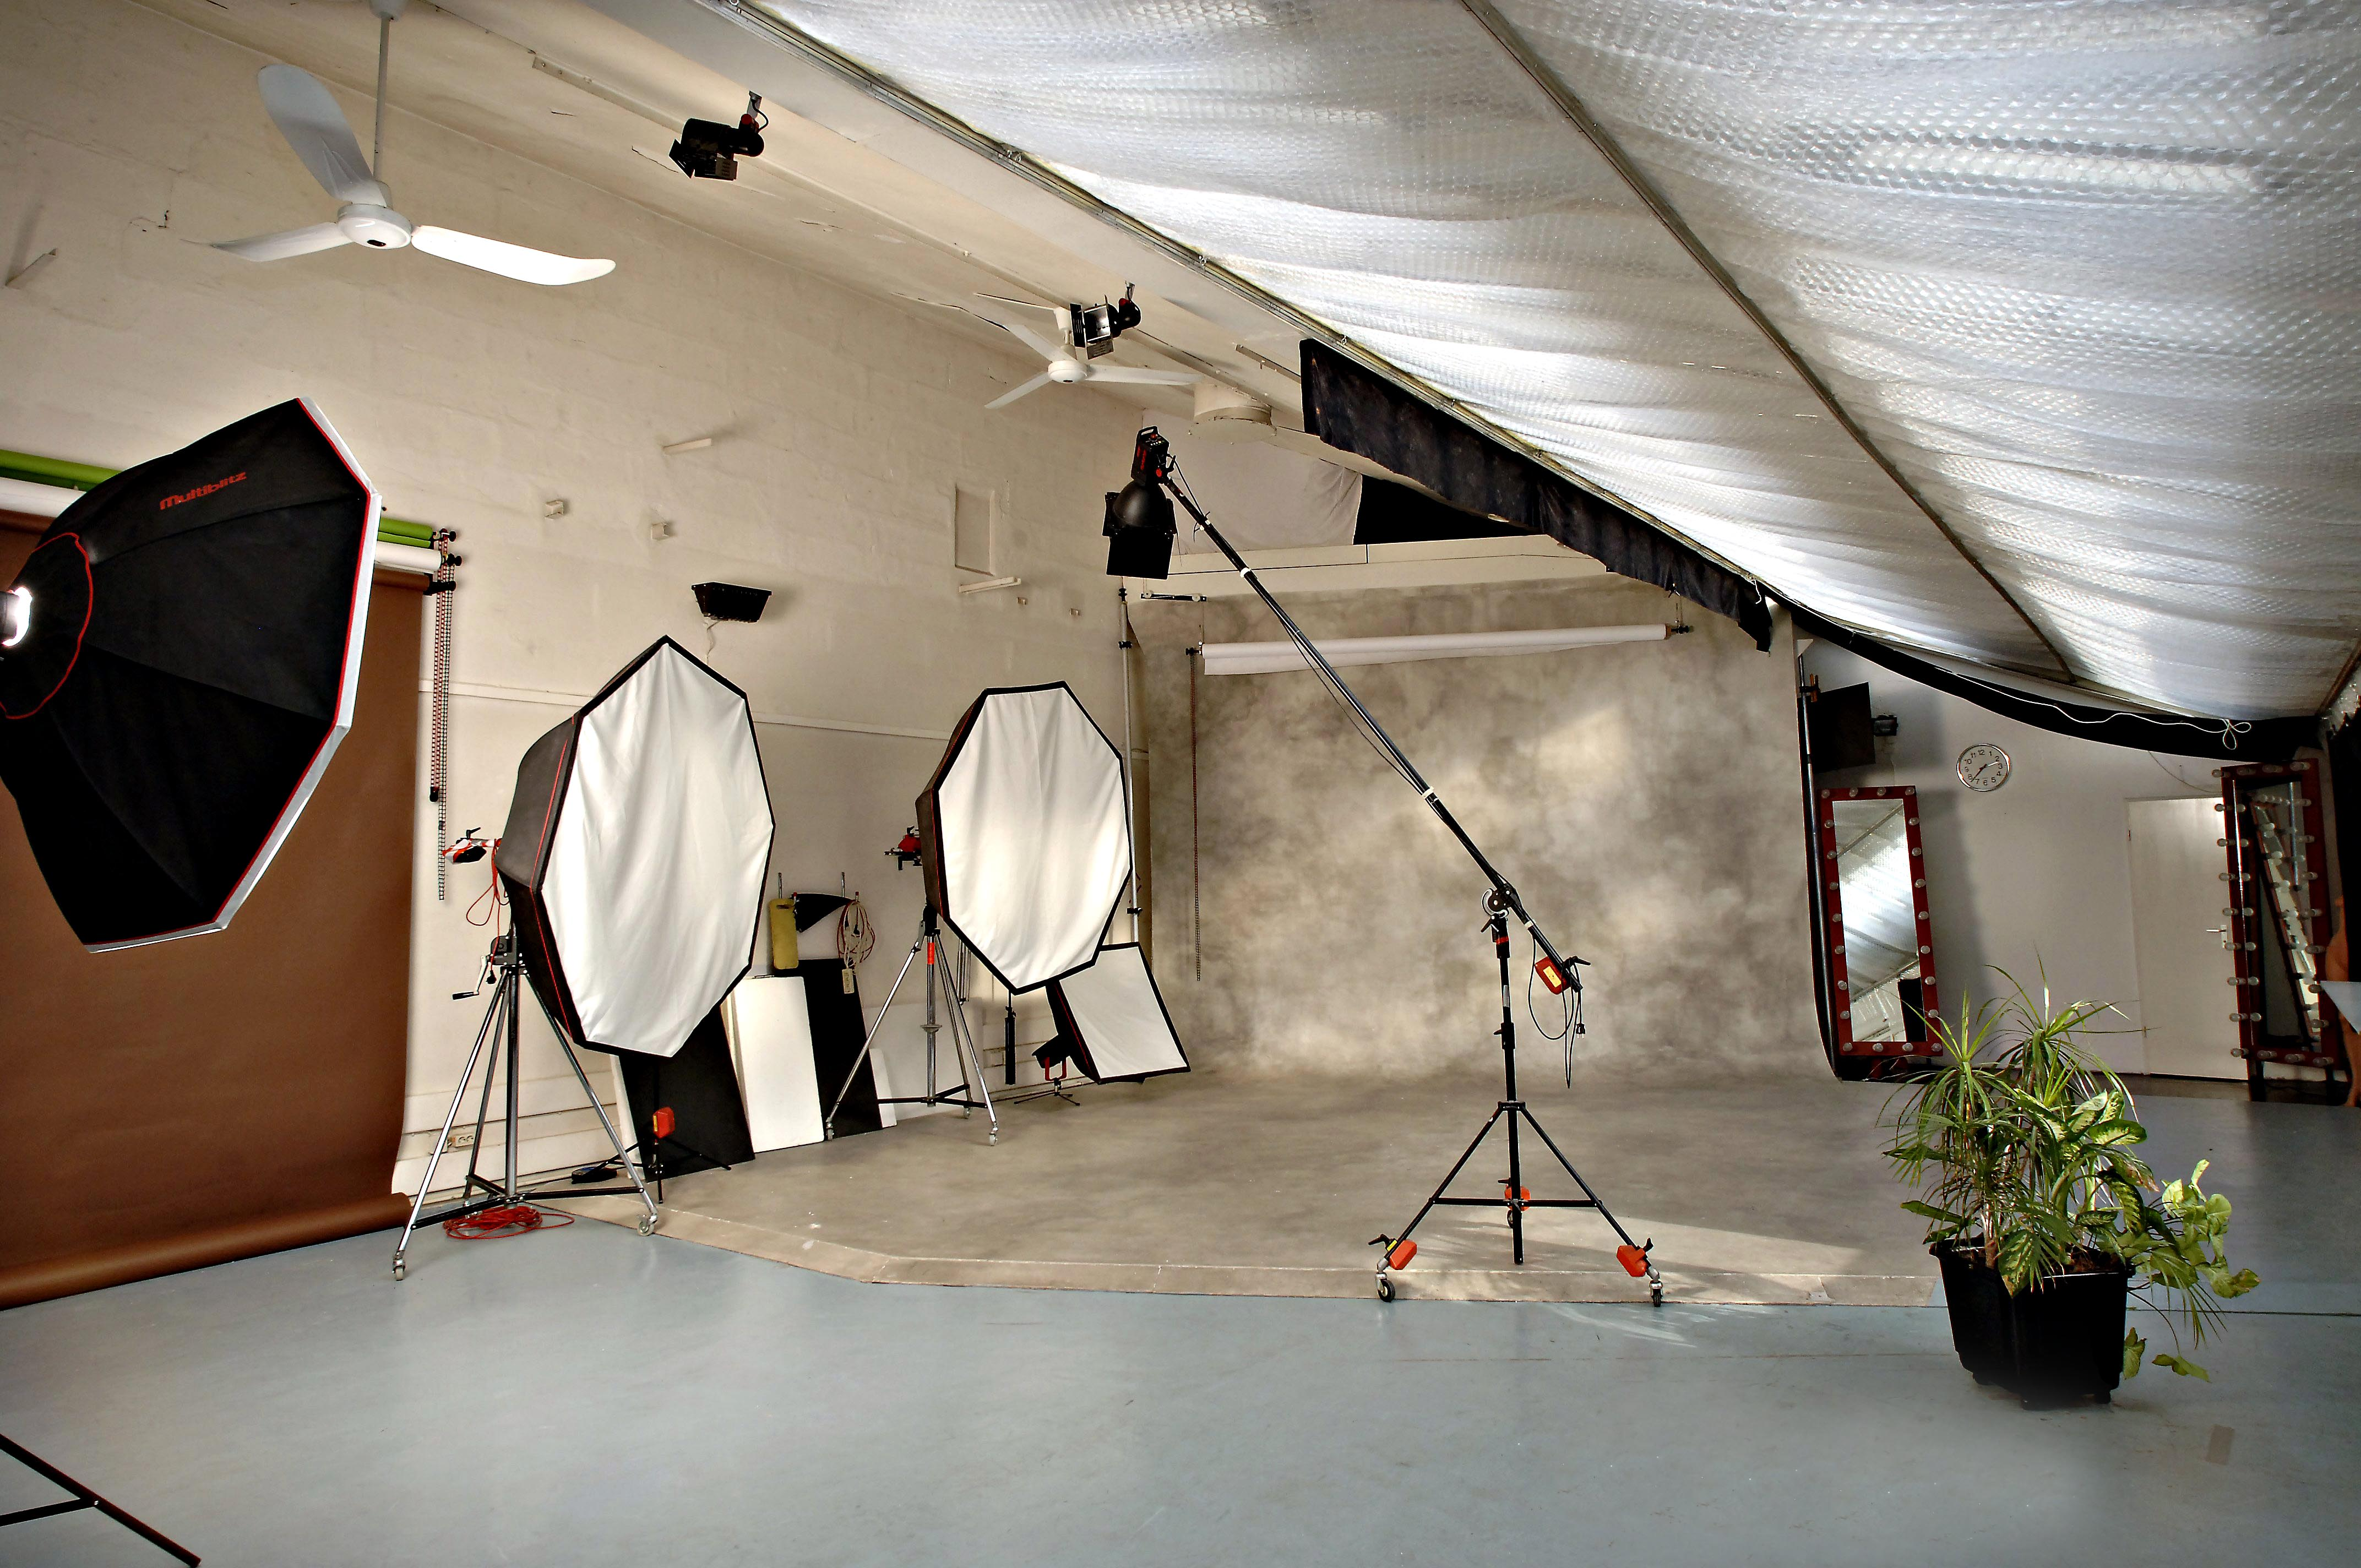 fotostduio mieten berlin rentstudio berlin in berlin dienstleistungen kleinanzeigen. Black Bedroom Furniture Sets. Home Design Ideas